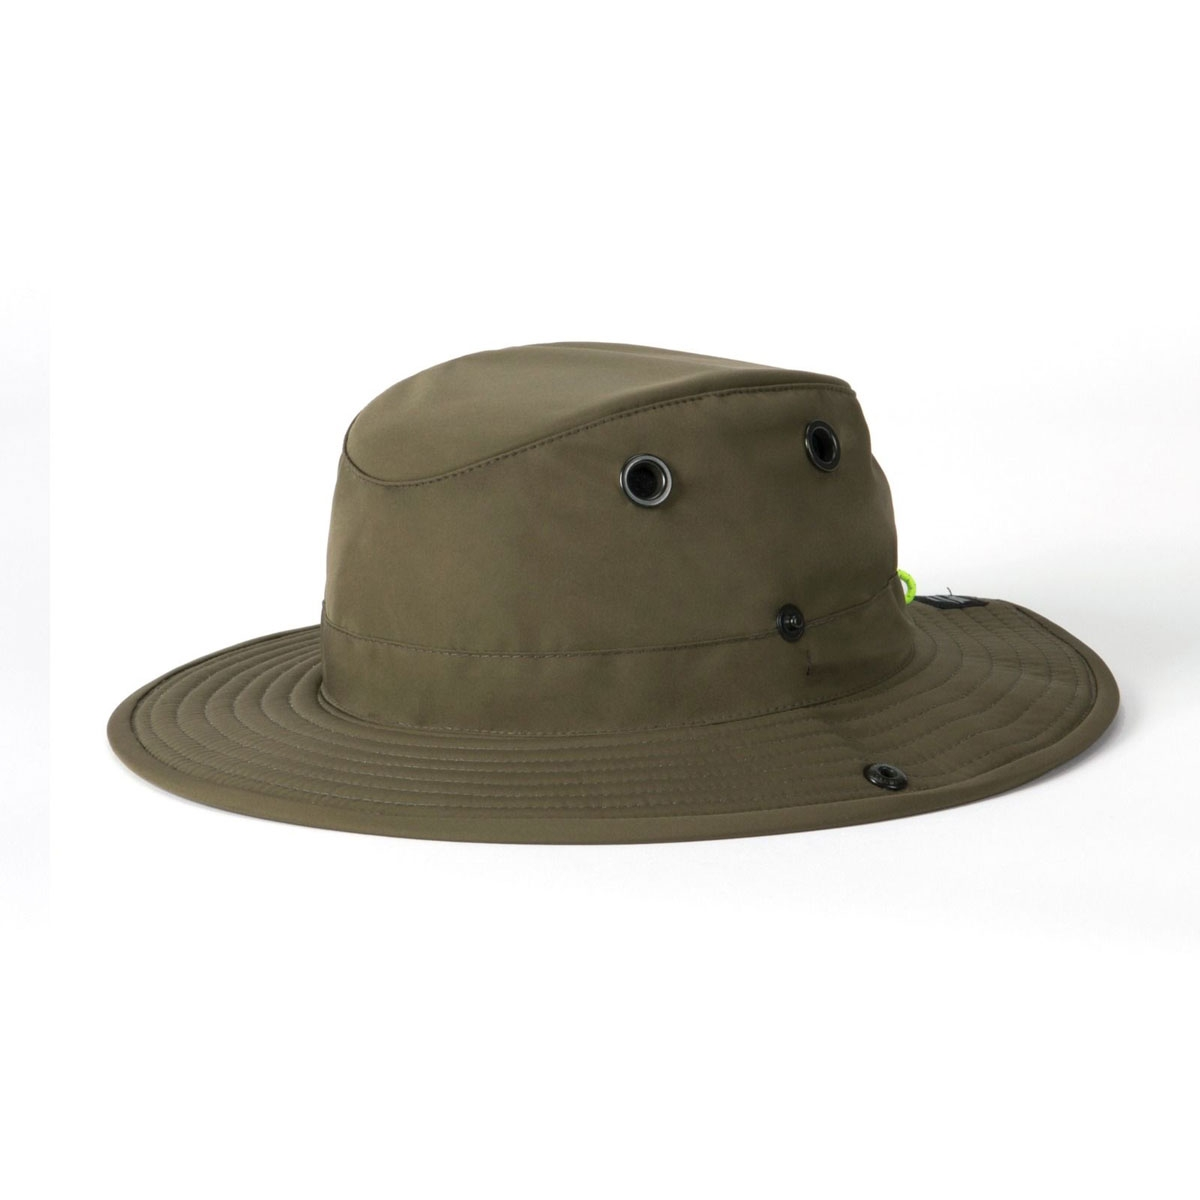 48844e74 Tilley Paddlers Hat - Olive | Uttings.co.uk